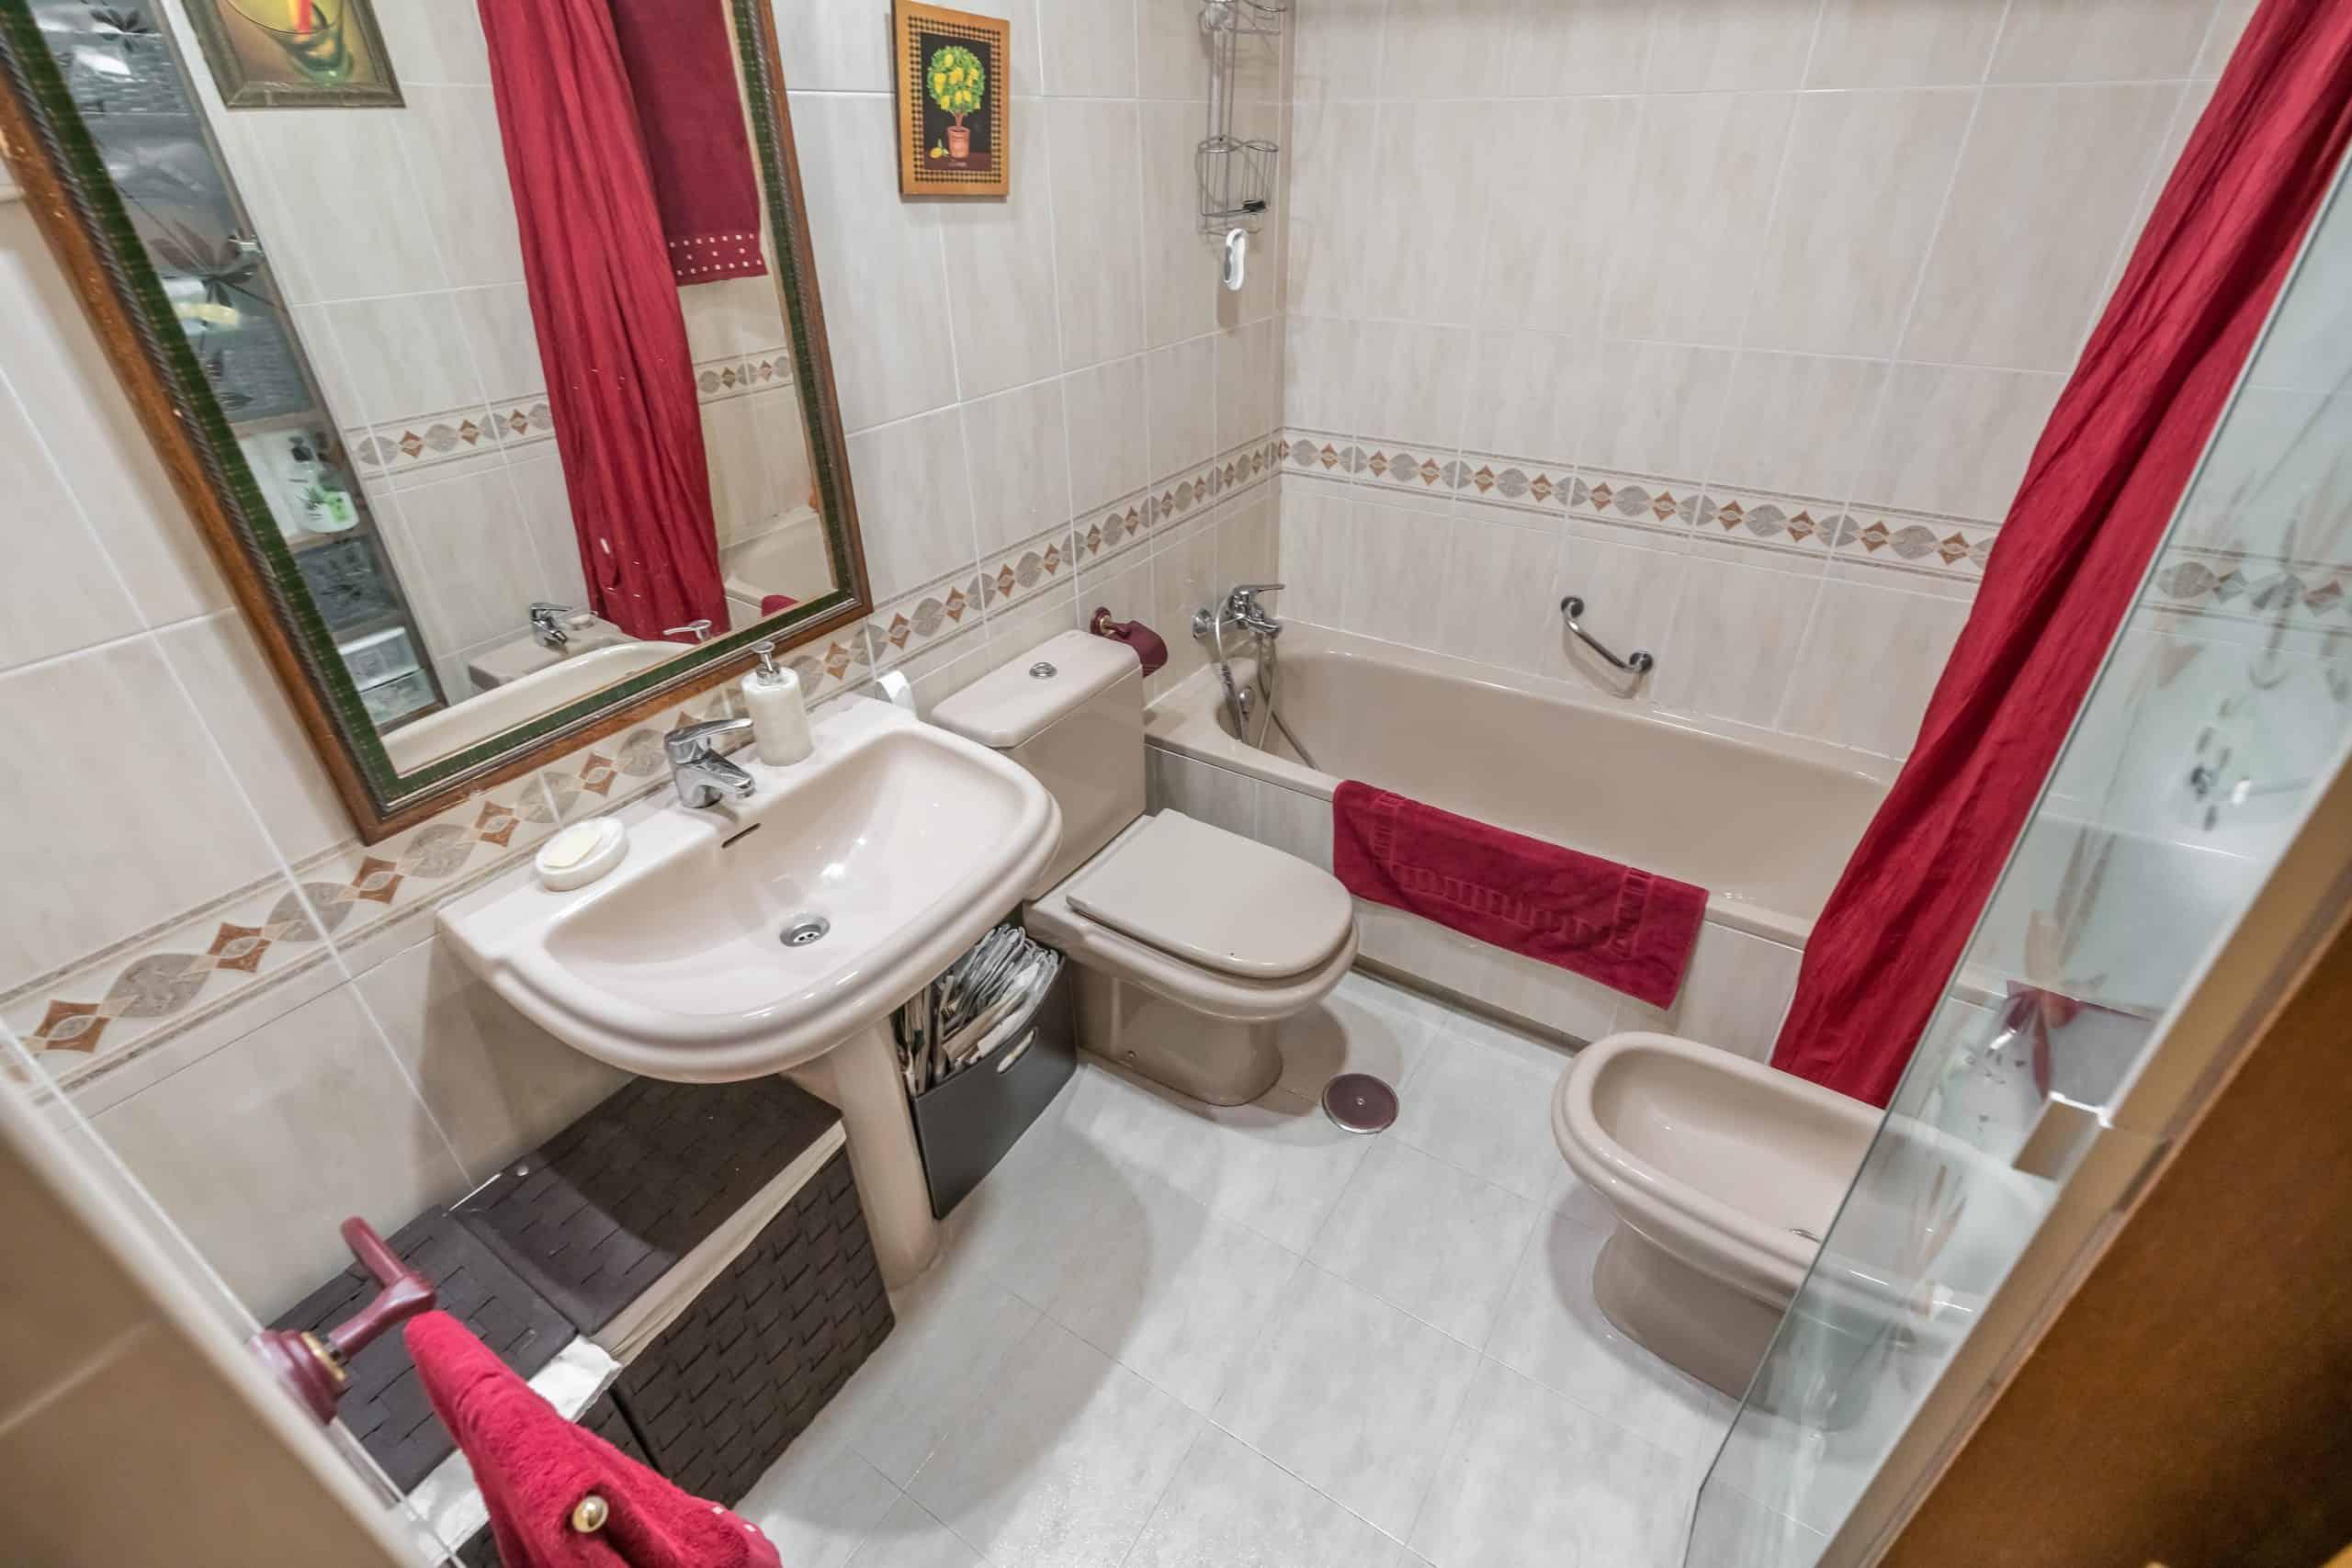 Agencia Inmobiliaria de Madrid-FUTUROCASA-Zona ARGANZUELA-EMBAJADORES-LEGAZPI3 BAÑO2 (2)